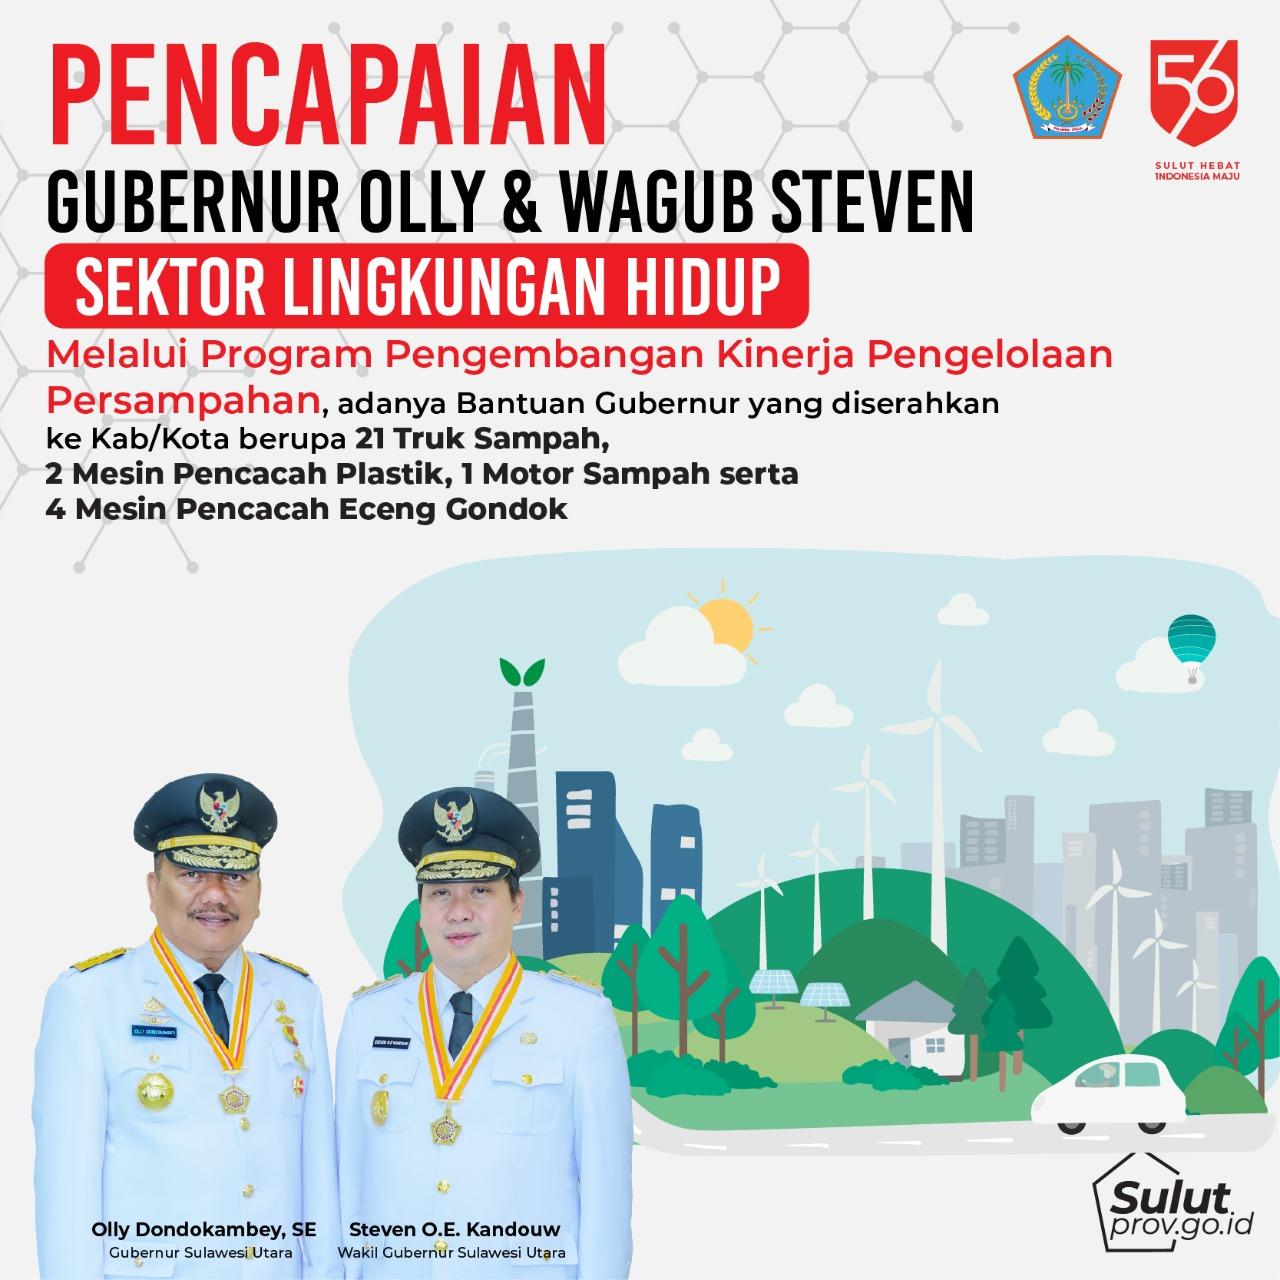 Pencapaian Sektor Lingkungan Hidup Gubernur Sulawesi Utara Olly Dondokambey dan Wakil Gubernur Sulawesi Utara Steven Kandouw